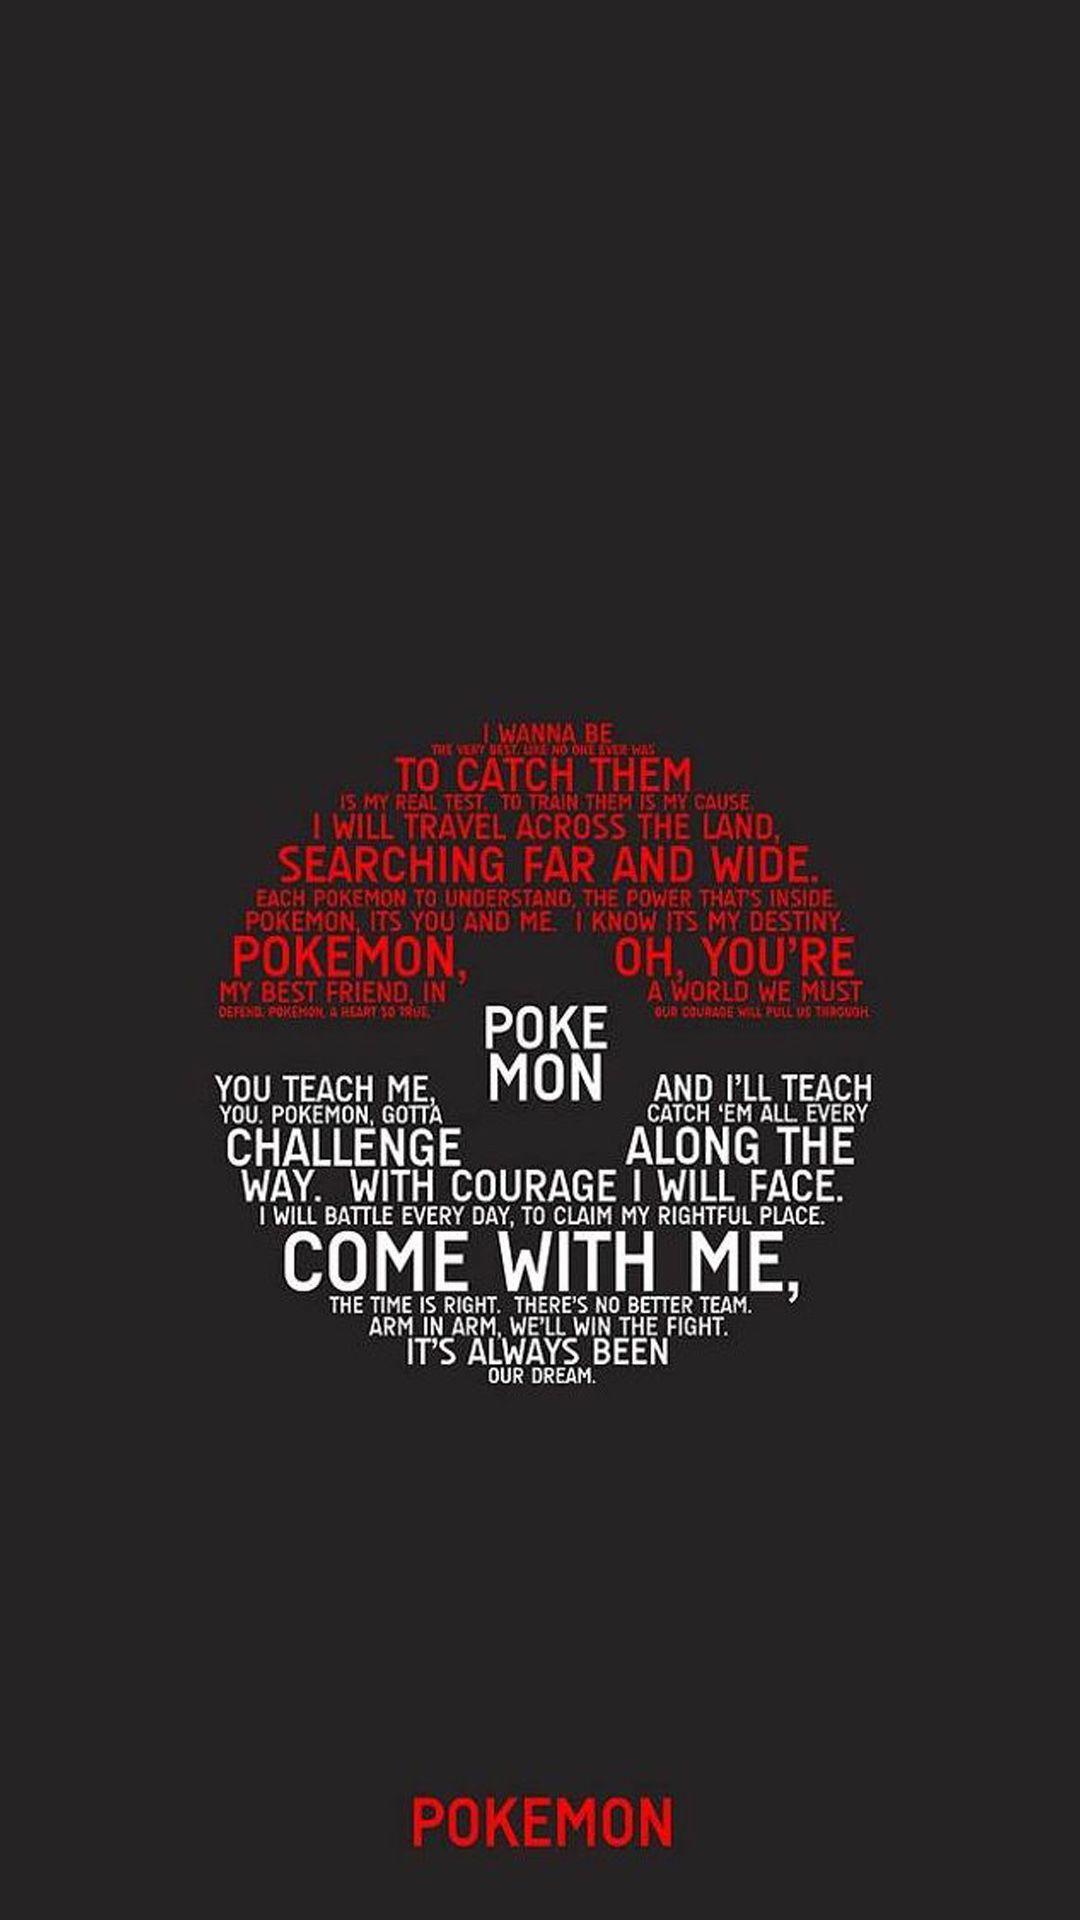 Pokemon Cool iOS wallpaper